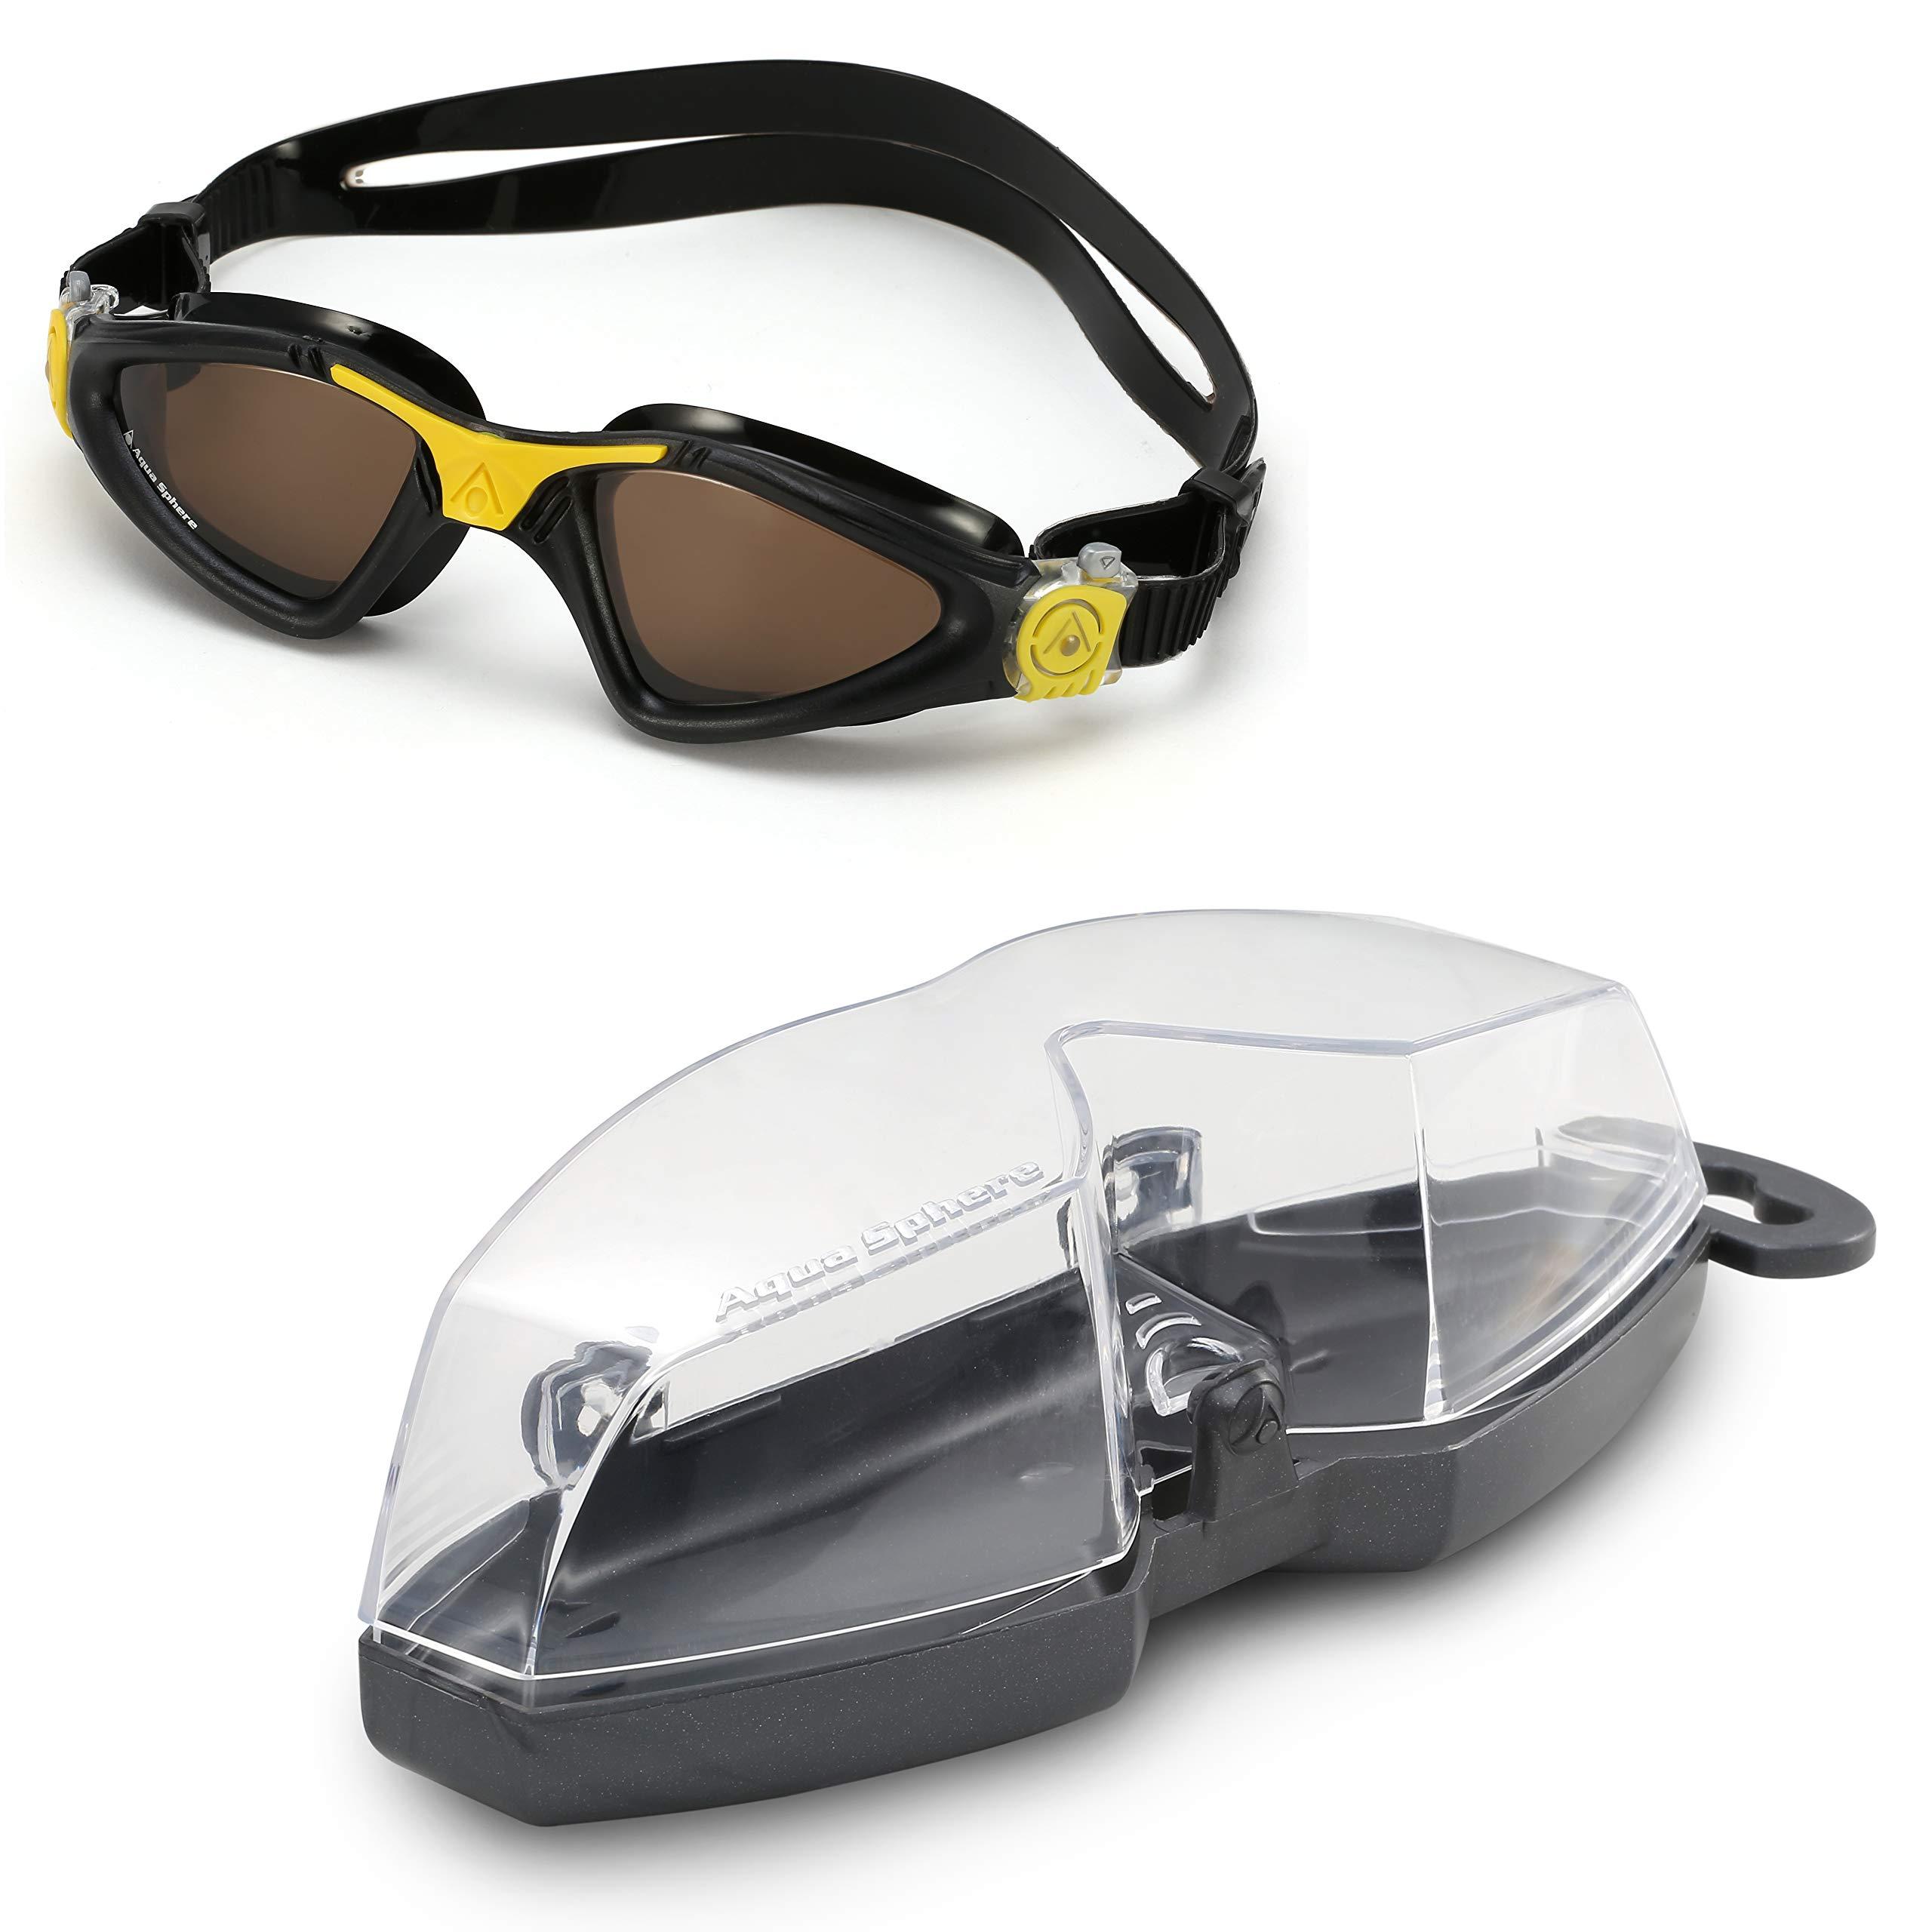 37e4f7b46ff Aqua Sphere Kayenne Swim Goggles with Polarized Lens (Black Yellow) -  EP122144   Goggles   Sports   Outdoors - tibs